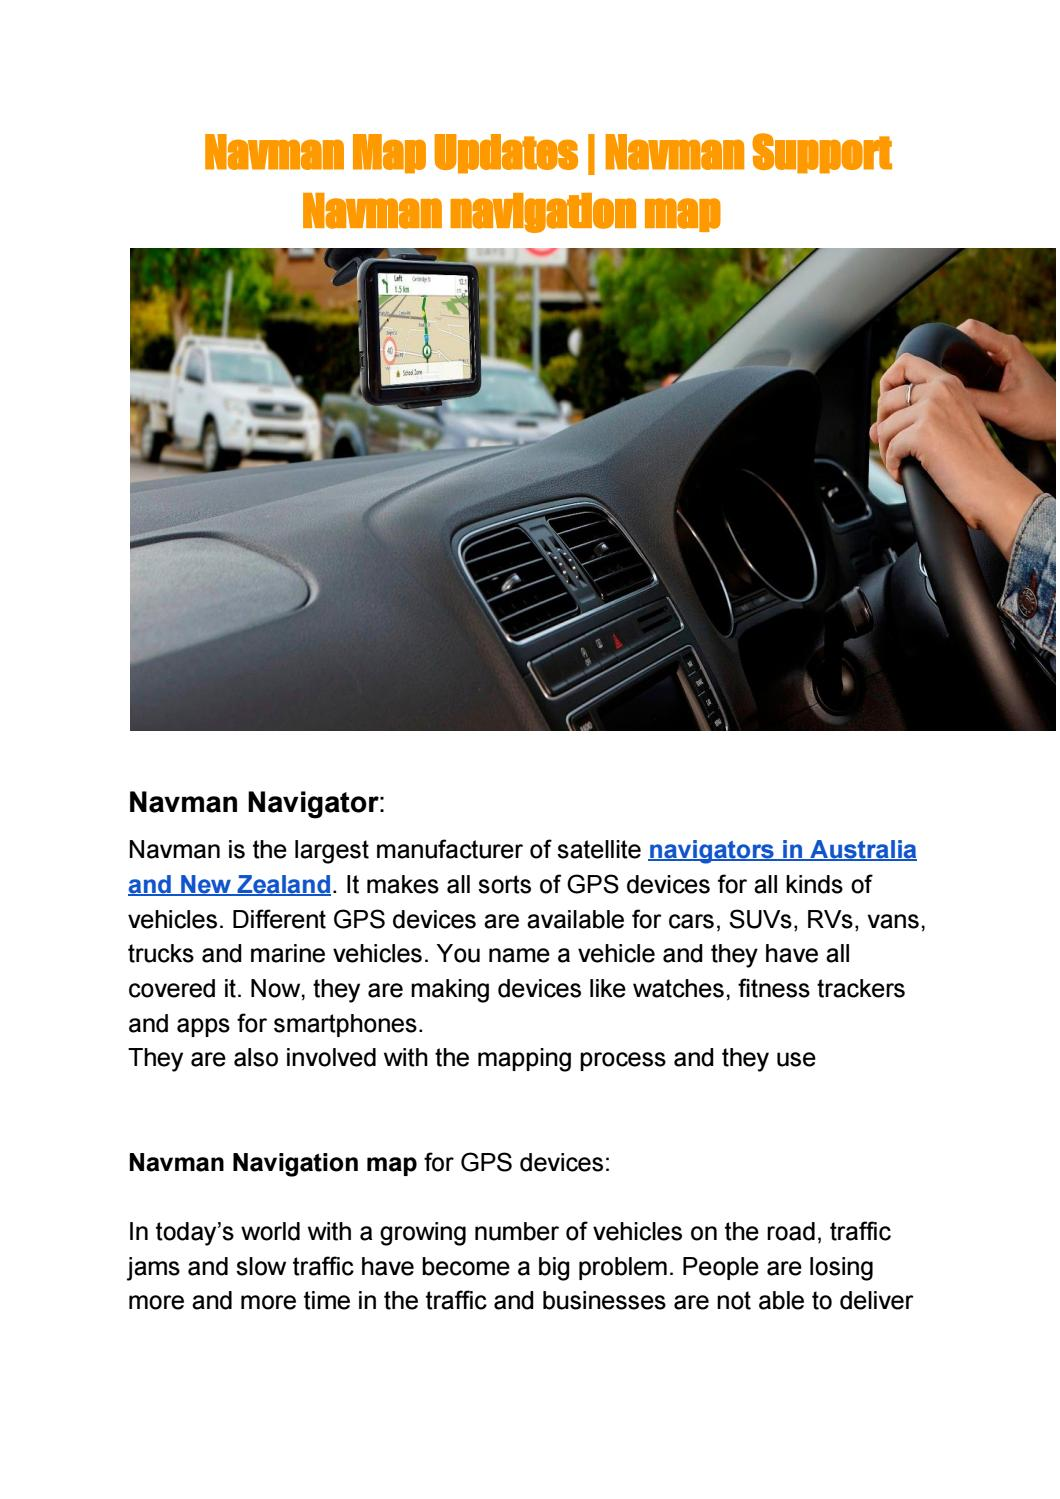 Updating navman 100 free no credit card online dating